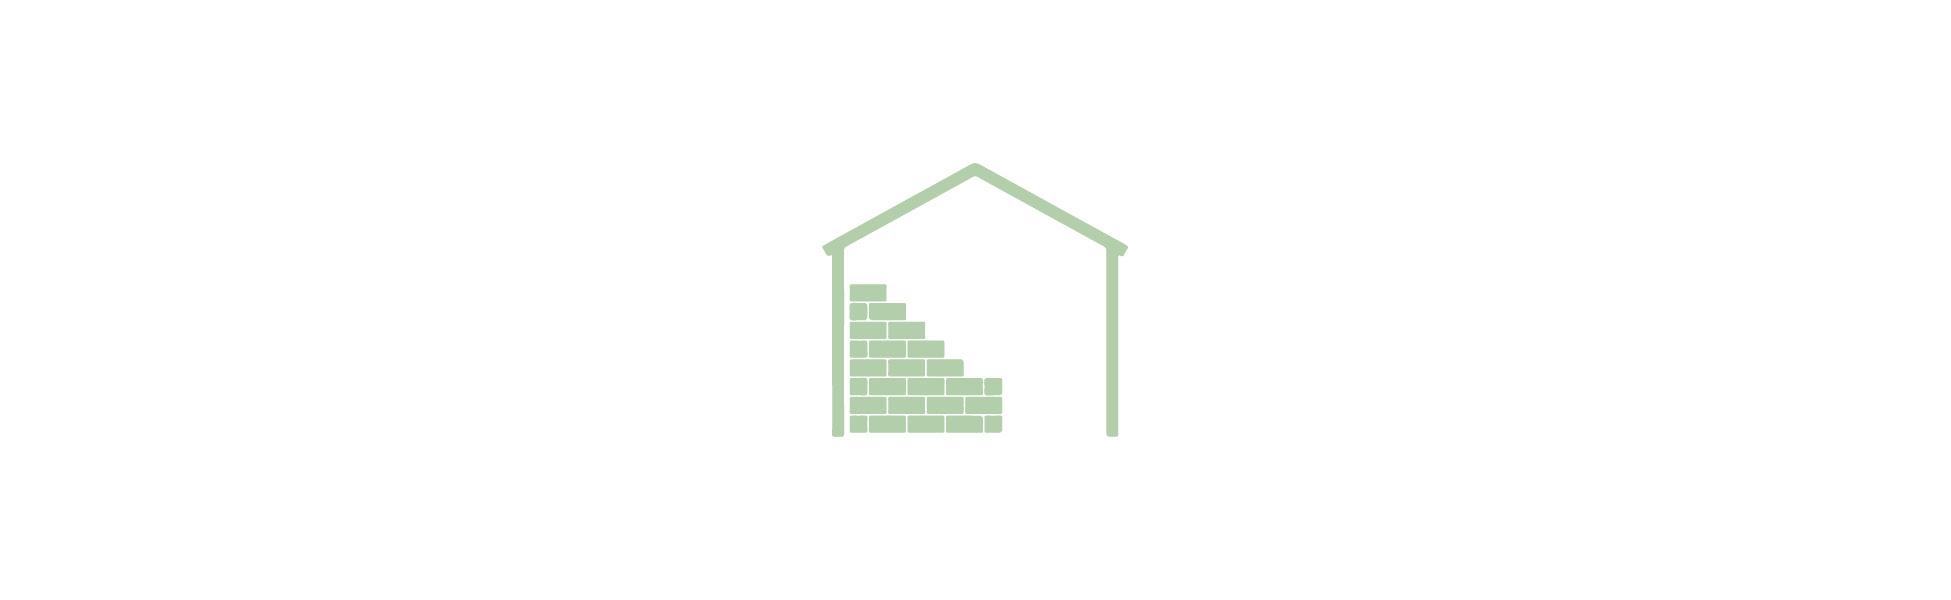 house wide.jpg